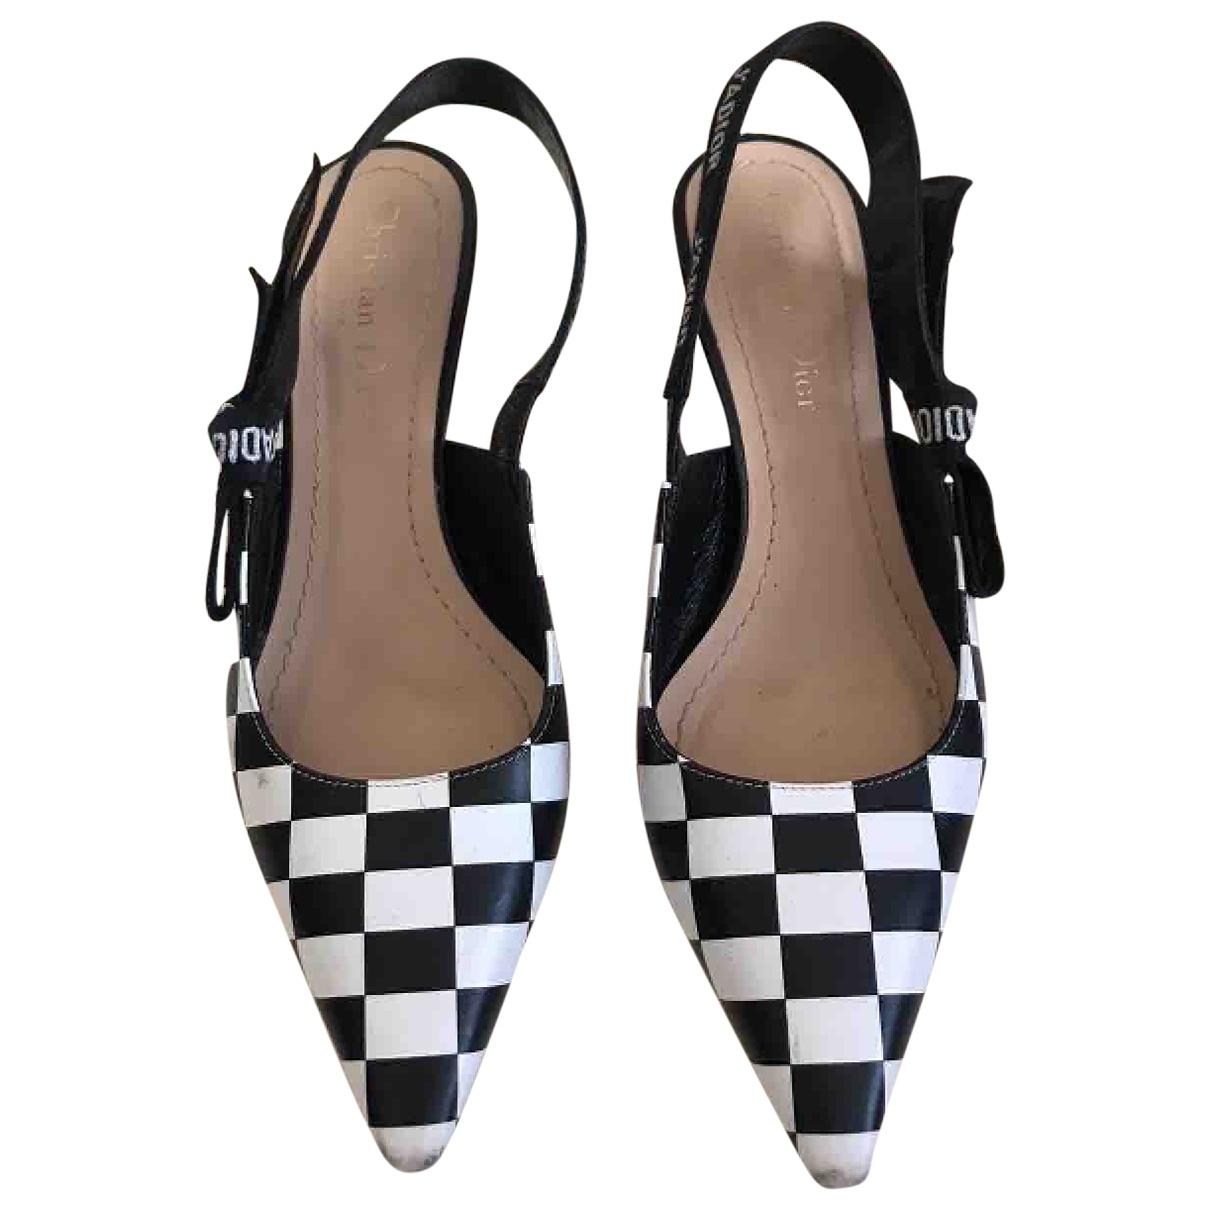 Dior J'adior Black Leather Heels for Women 36 EU